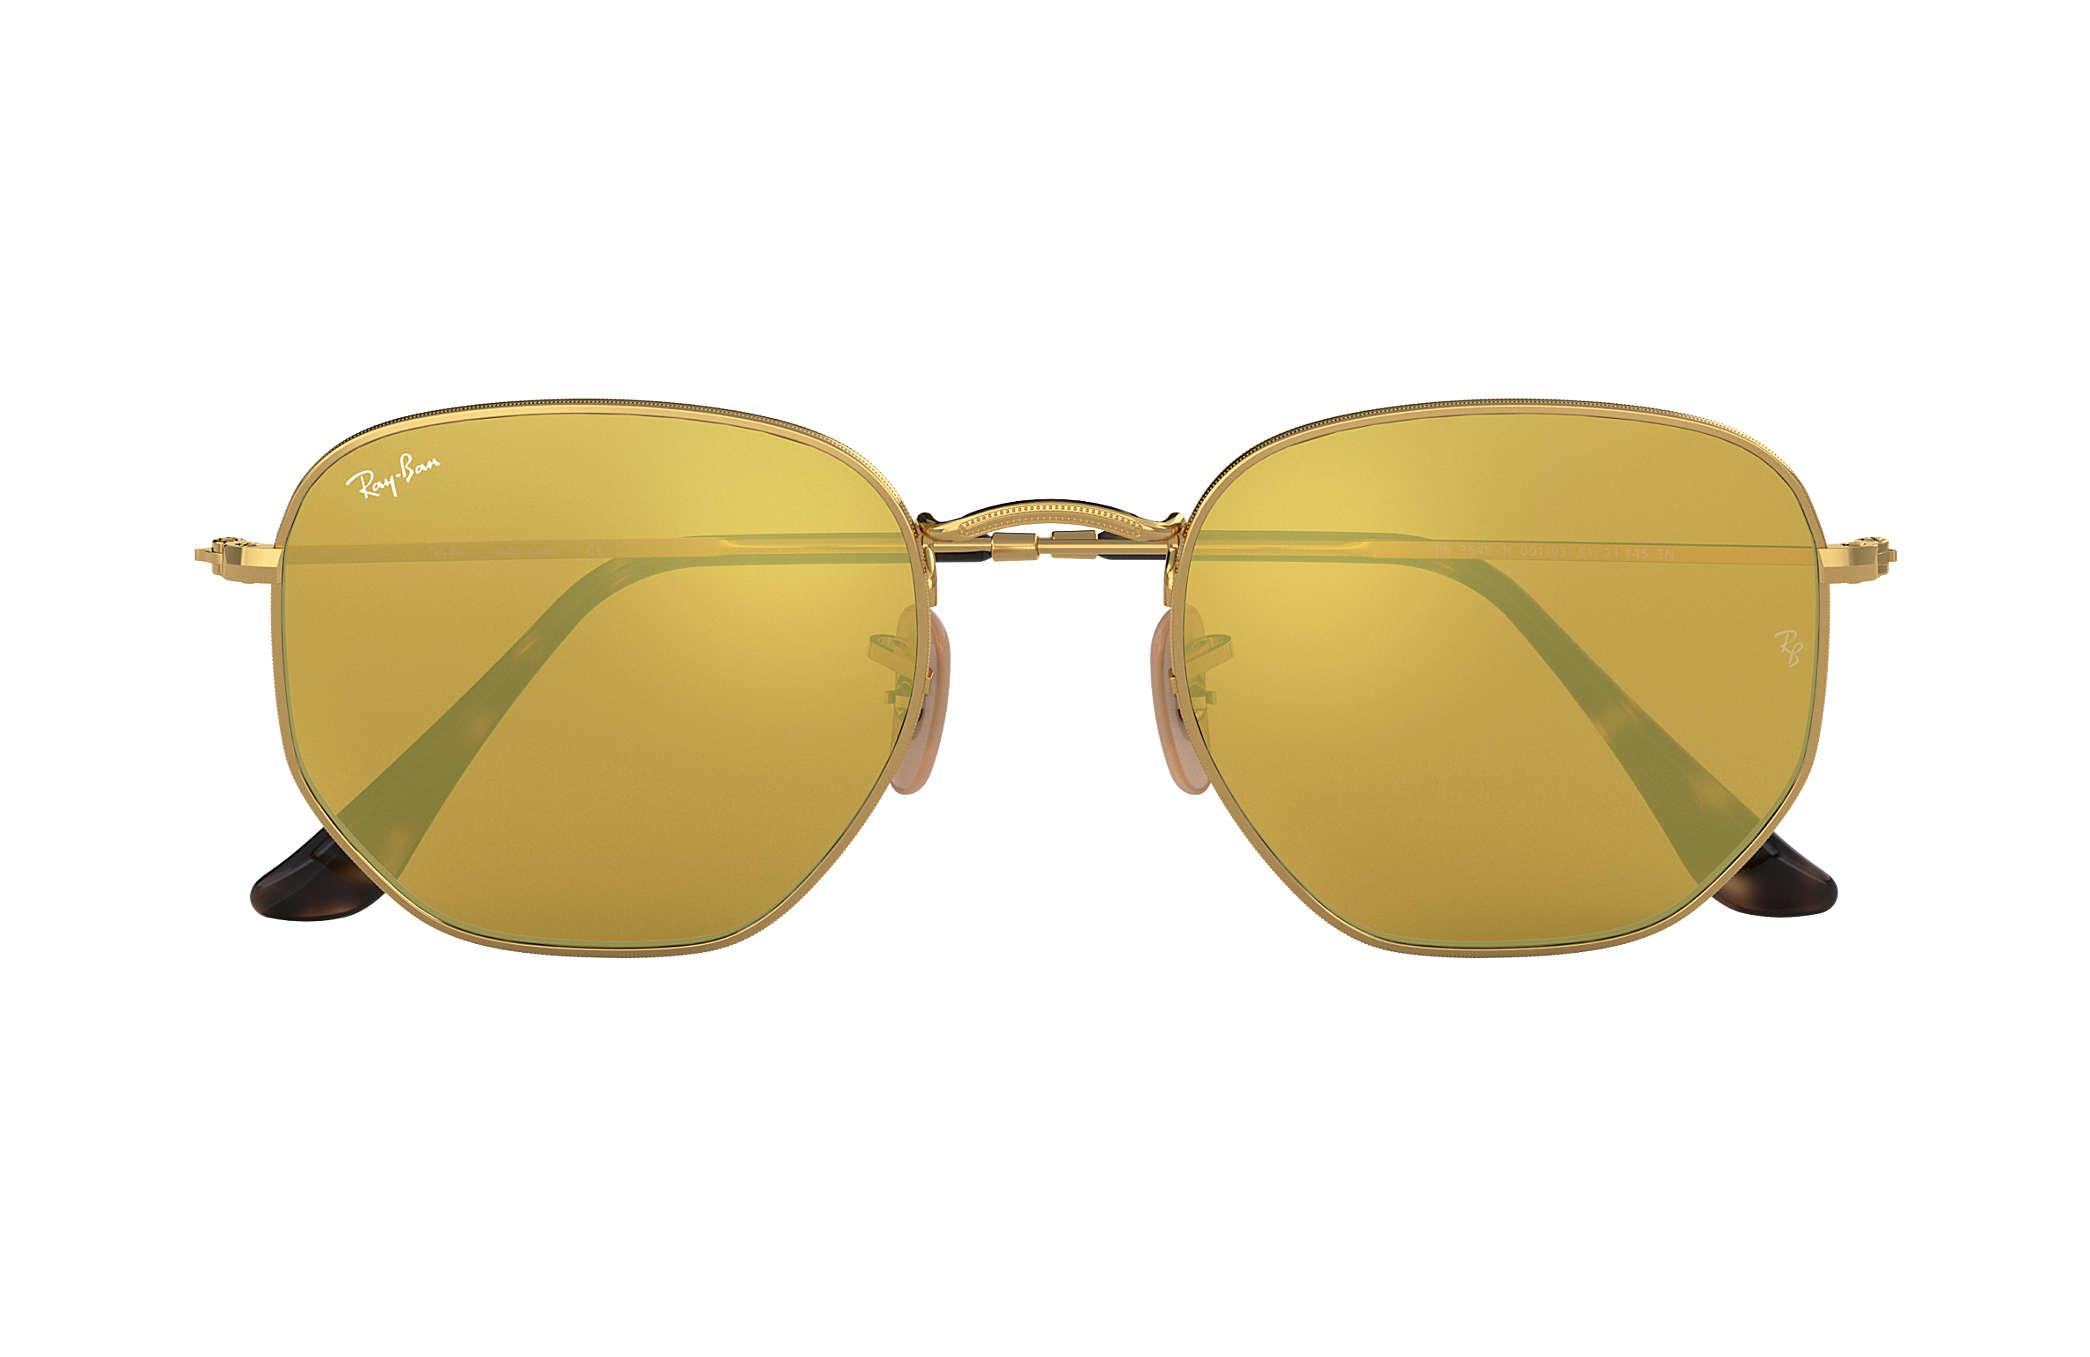 76f31f531b064 Ray-Ban Hexagonal Flat Lenses RB3548N Ouro - Metal - Lentes Amarelo ...